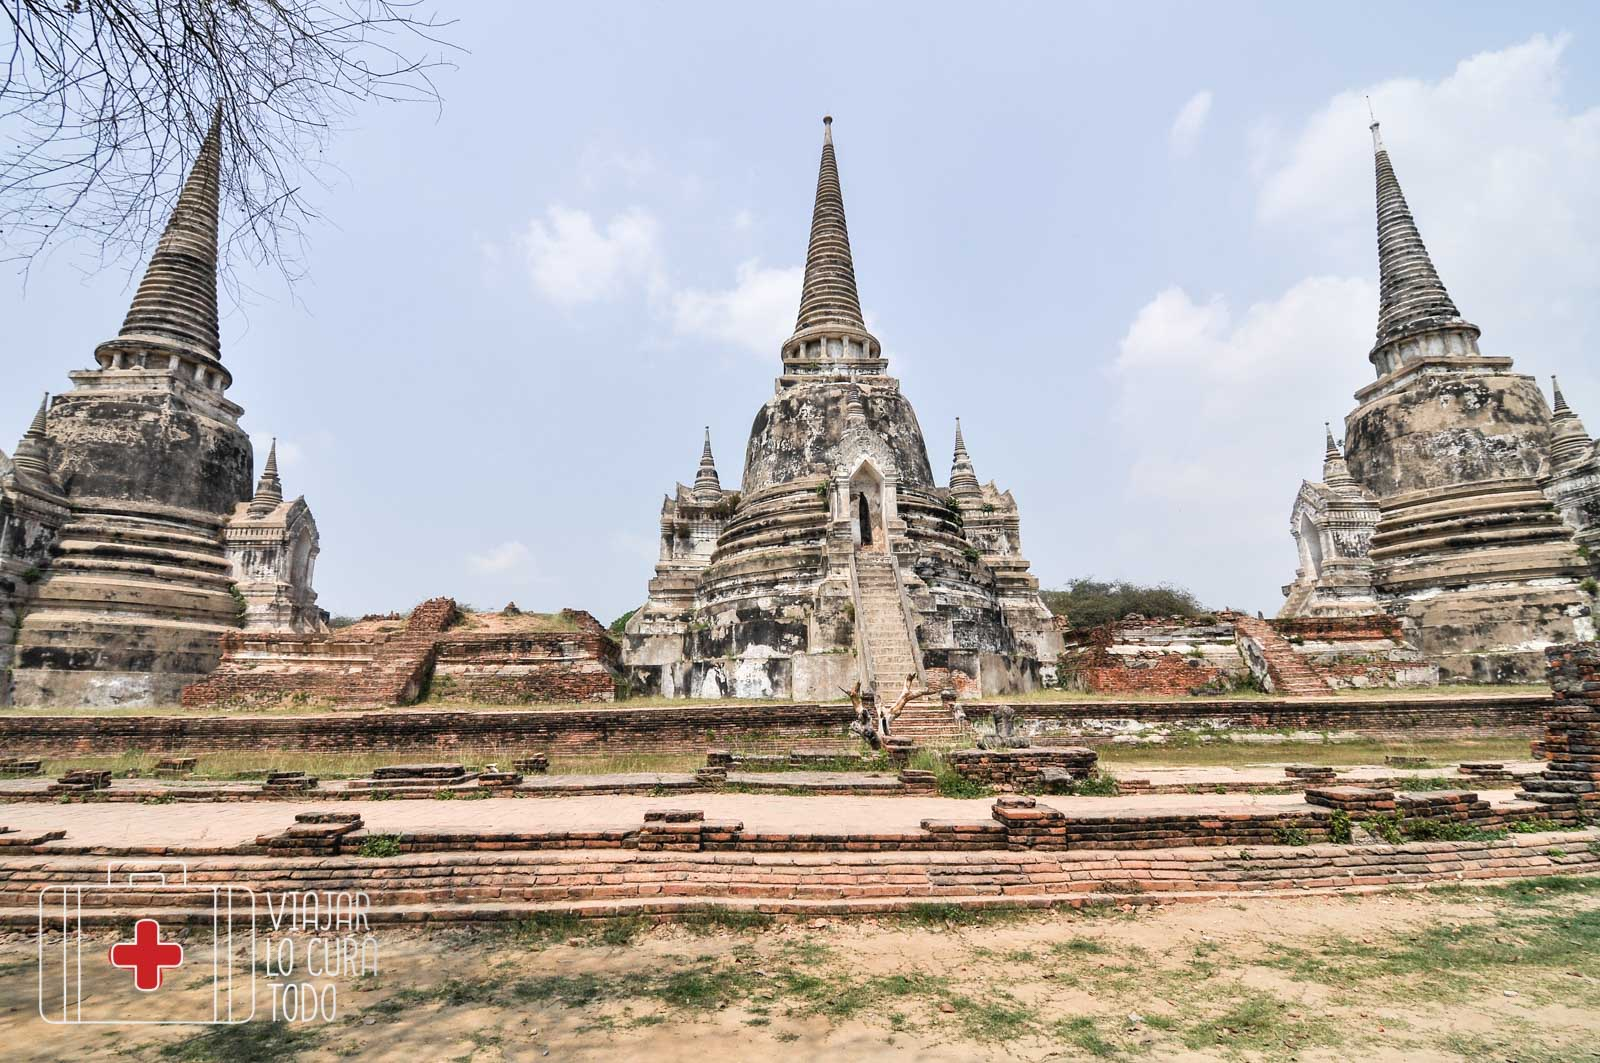 Wat Phra Ayuthaya ThailandiaSi Sanphet